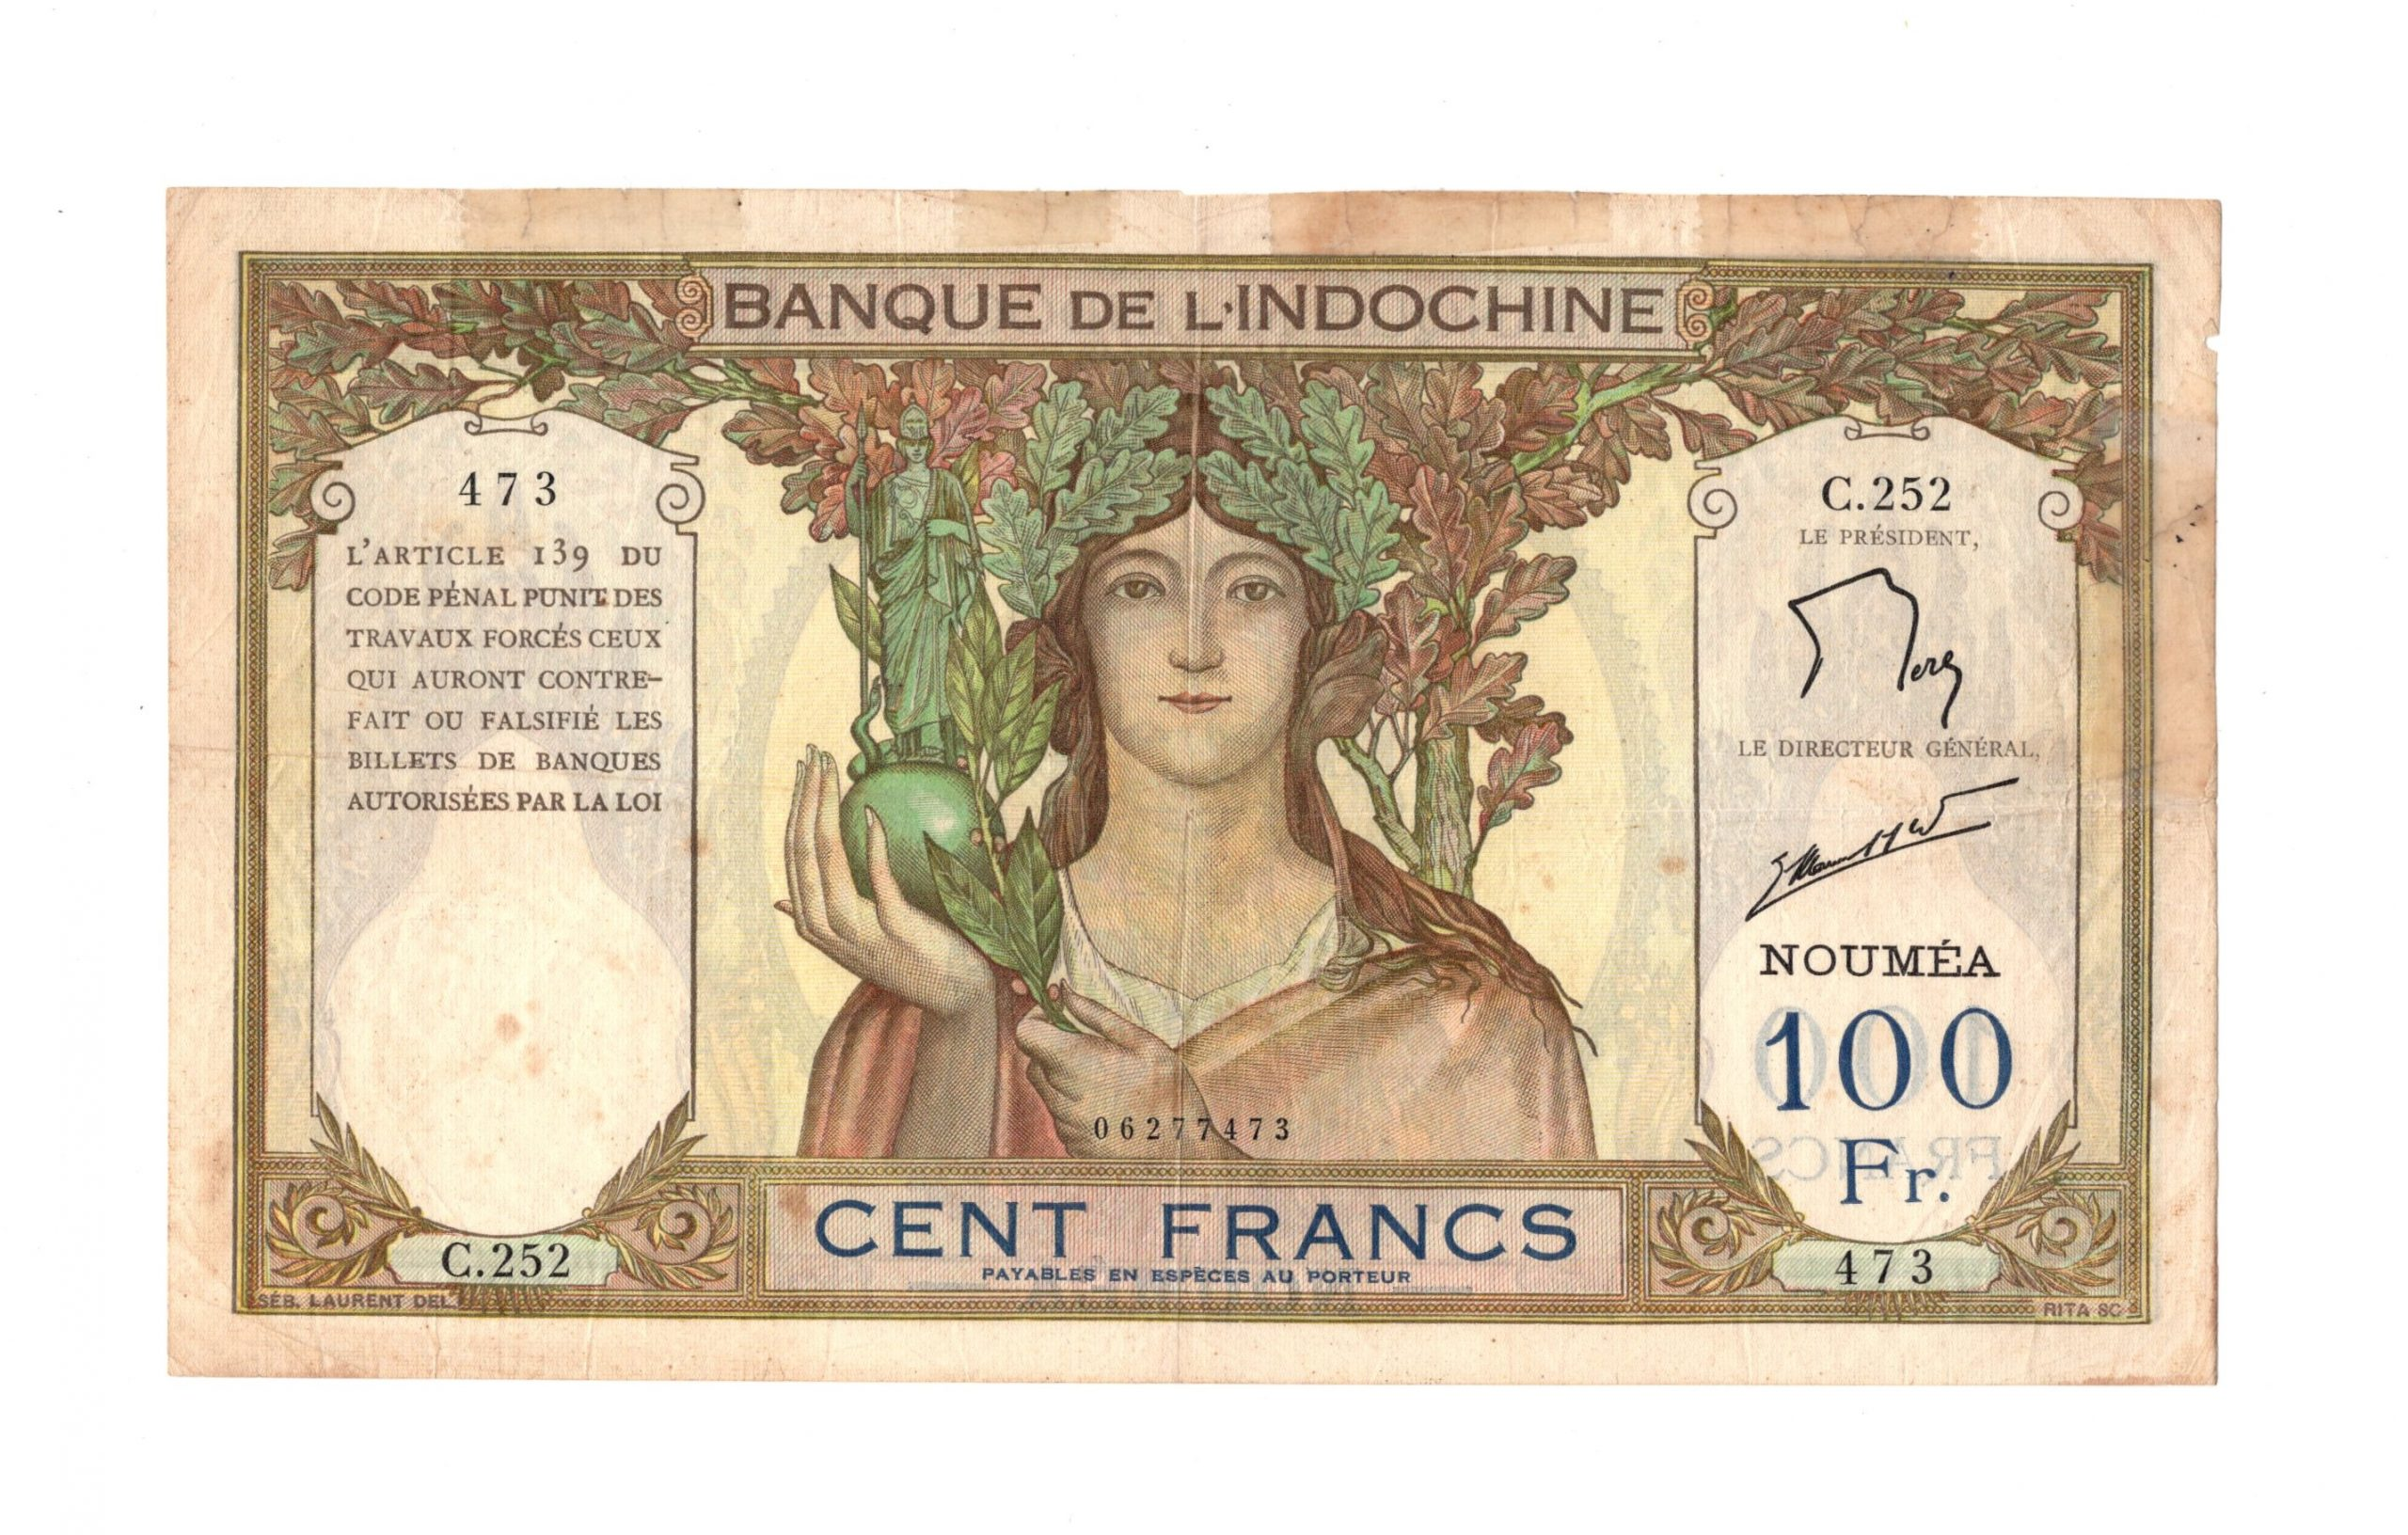 French Indochina new alwdonia 100 francs